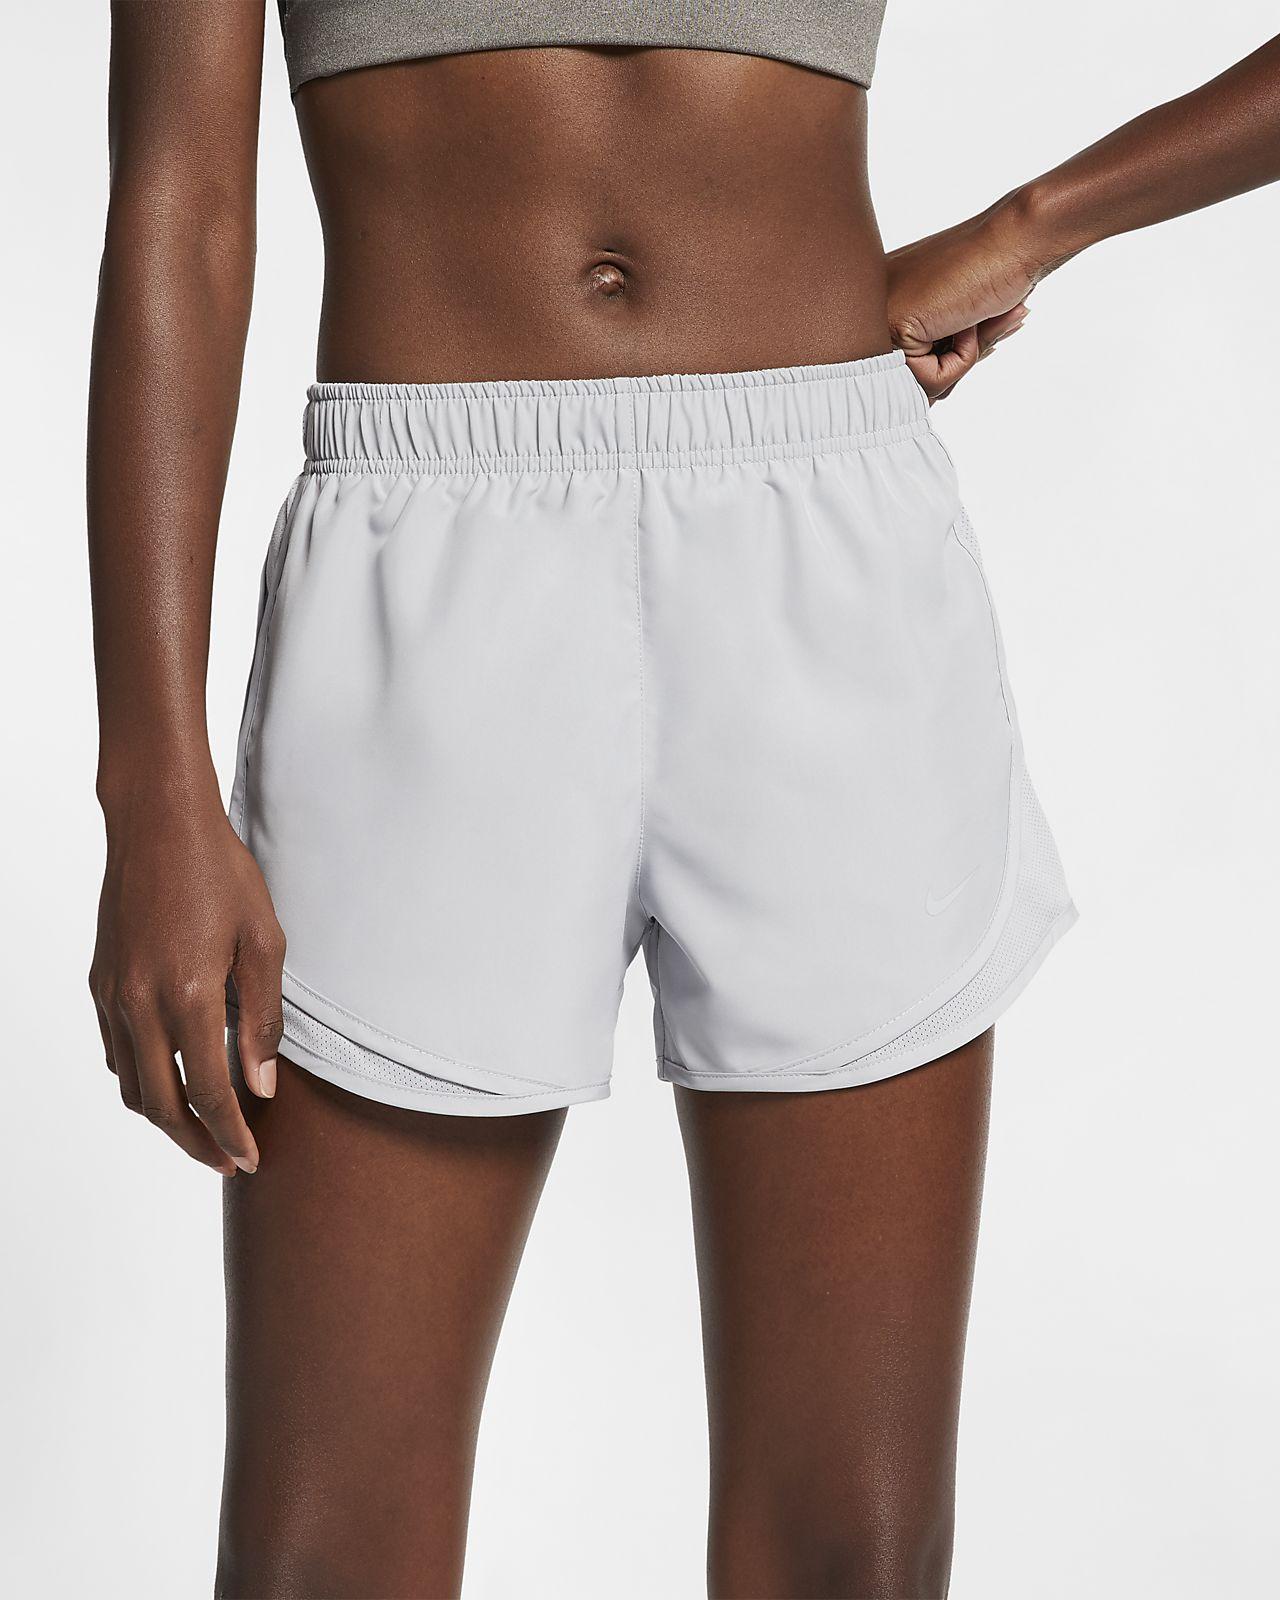 9bfe6403c Nike Tempo Women s Running Shorts. Nike.com